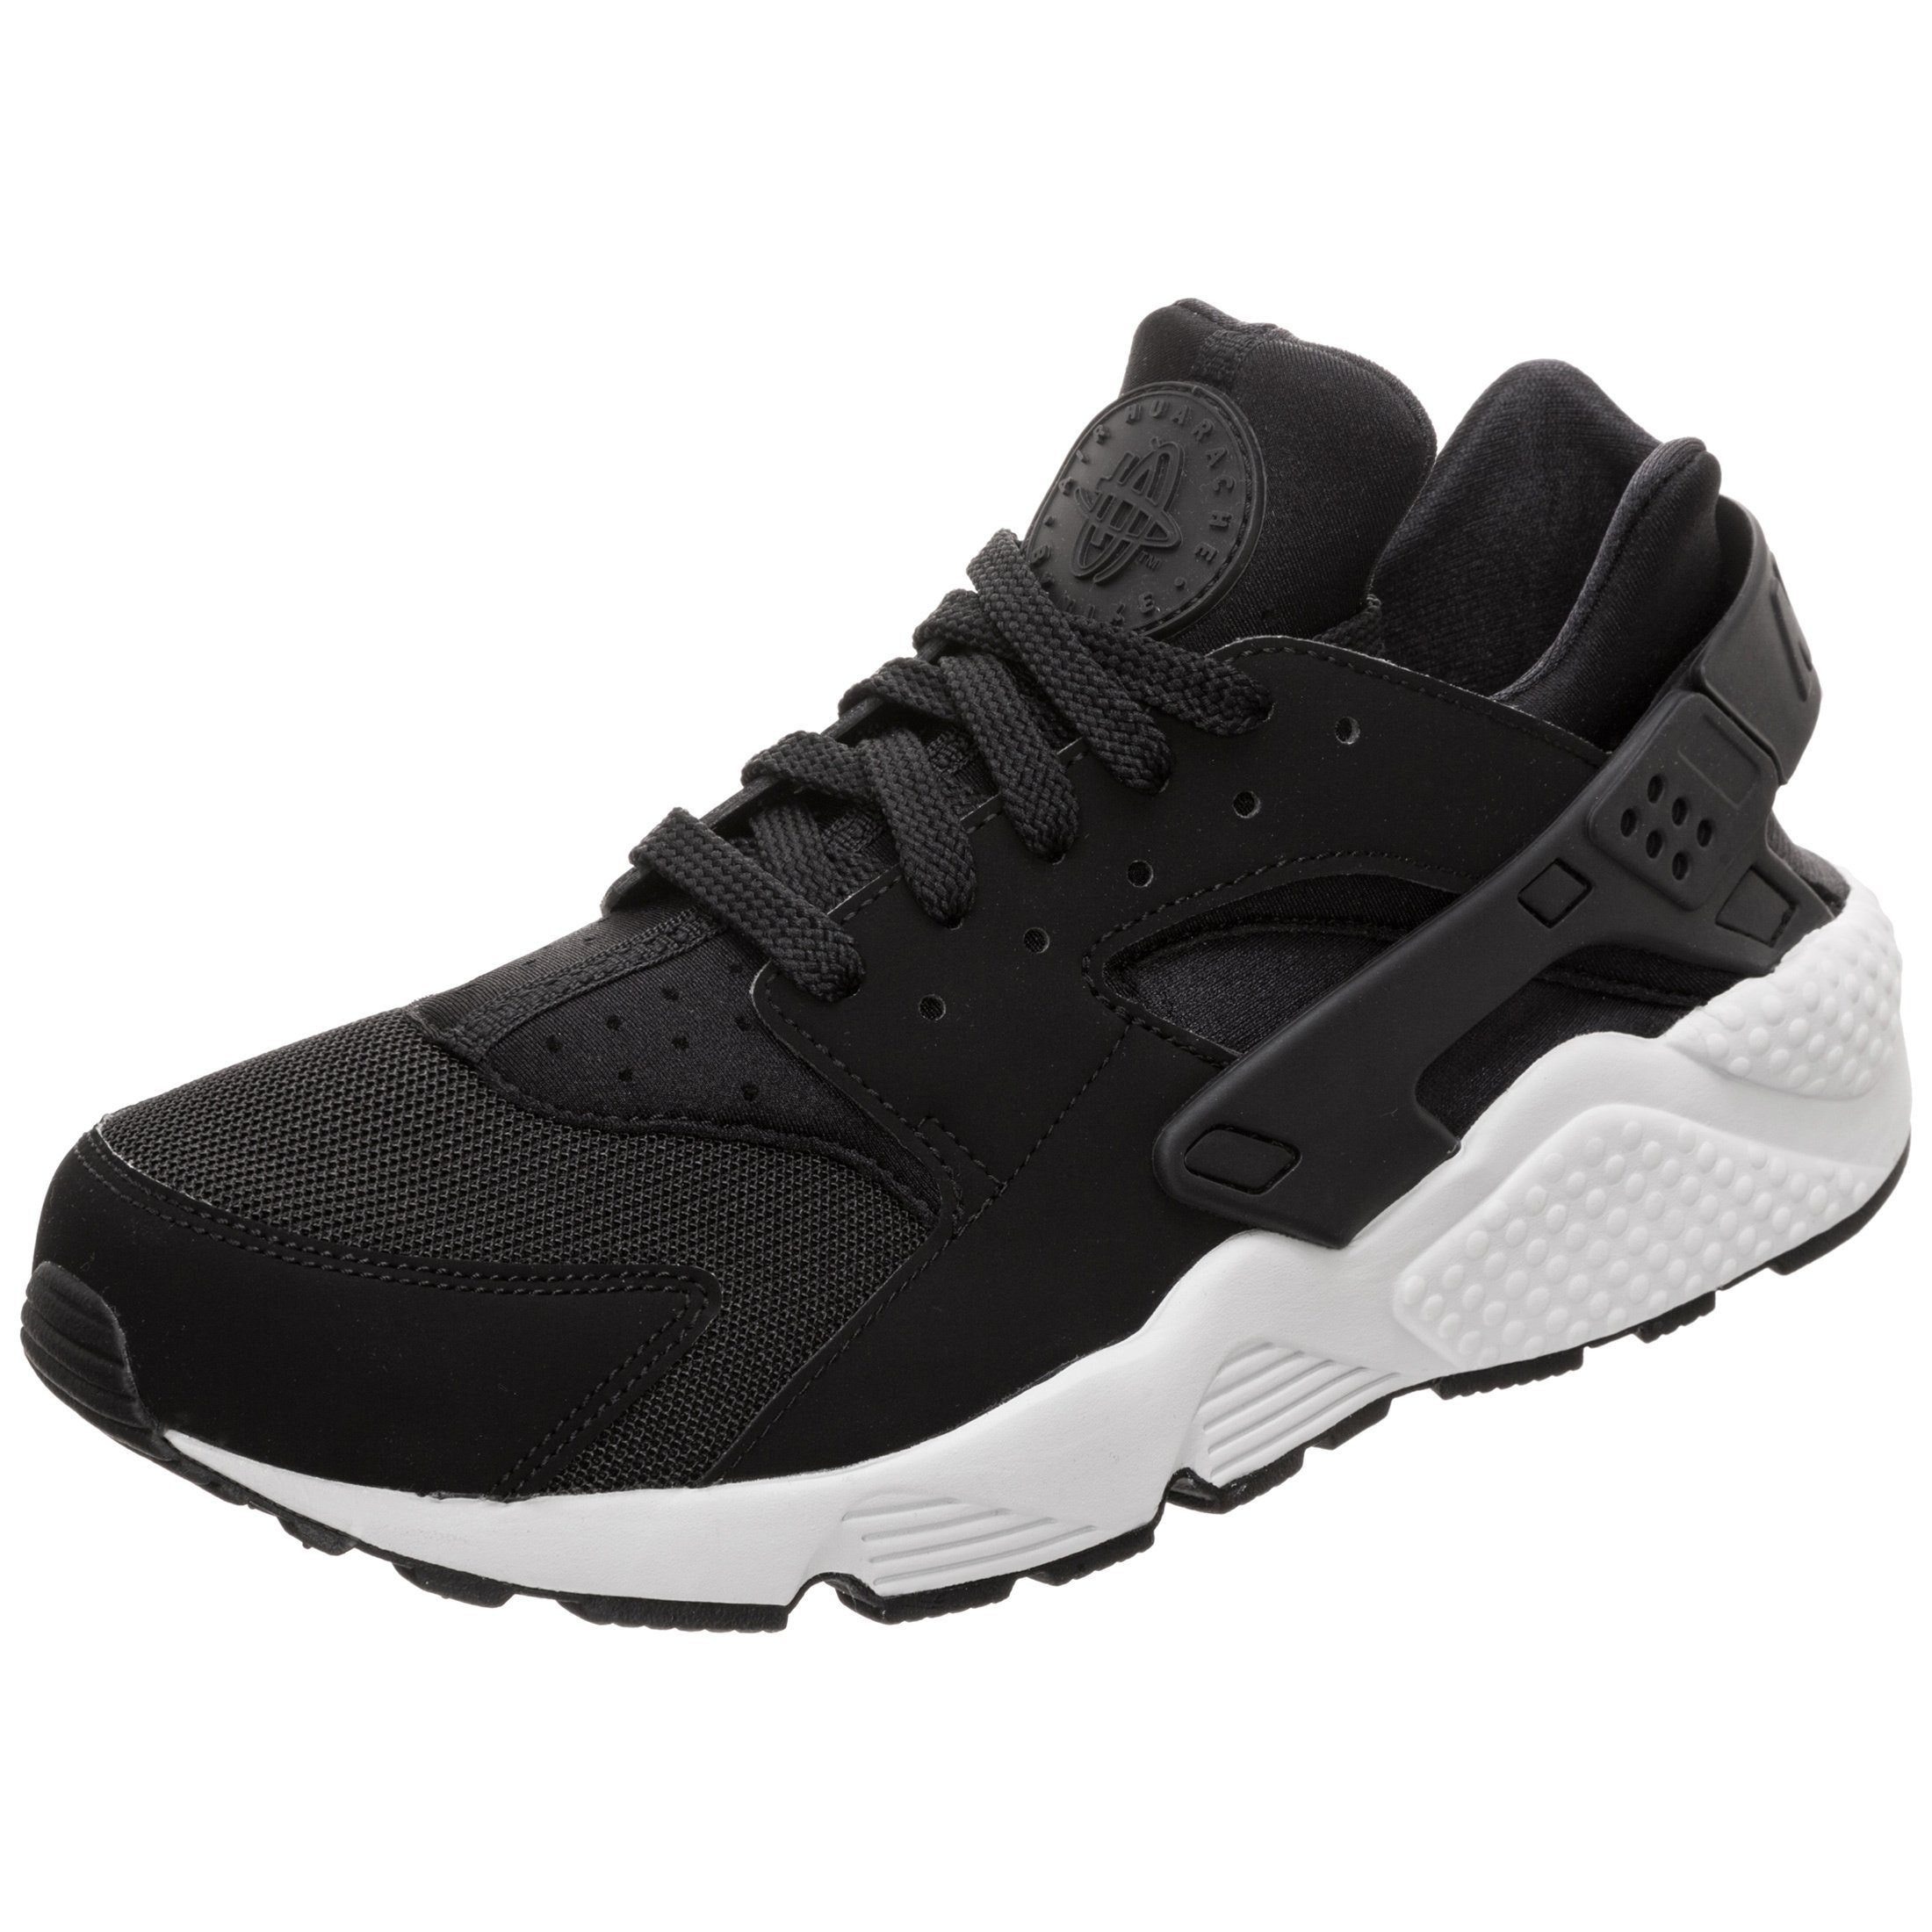 Nike Sportswear Sneaker Air Huarache online kaufen   Gutes Preis Leistungs Verhältnis,